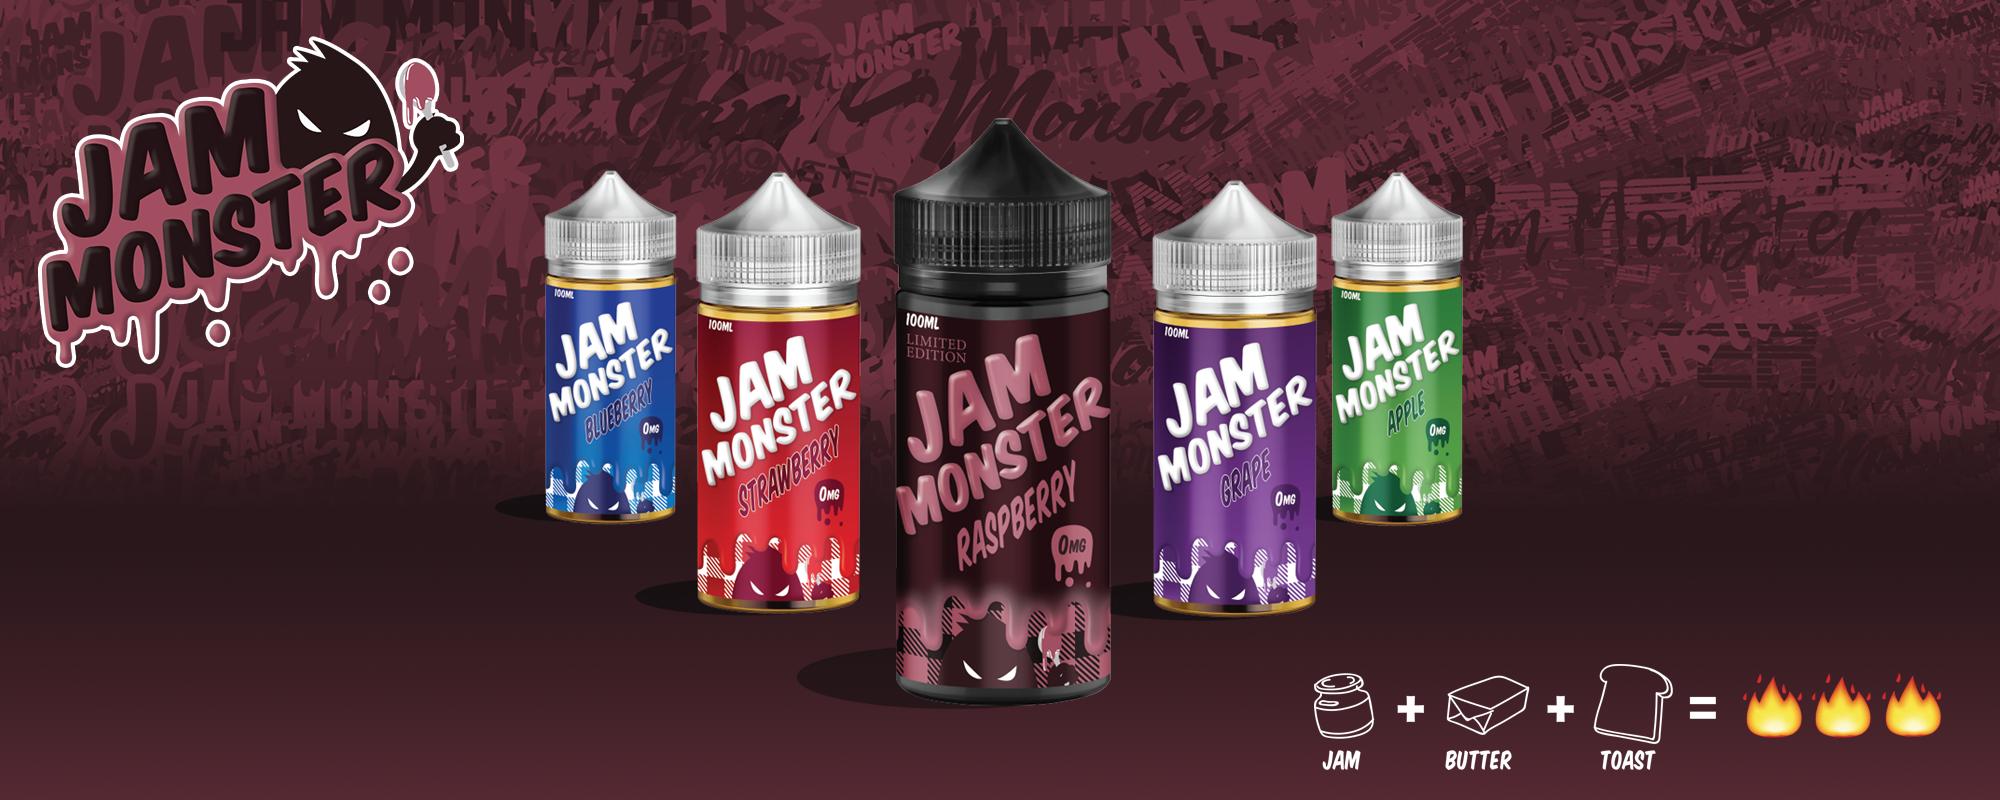 d2b54cbcd371 Жидкость Jam Monster купить Lucky-Smoker.ru Москва